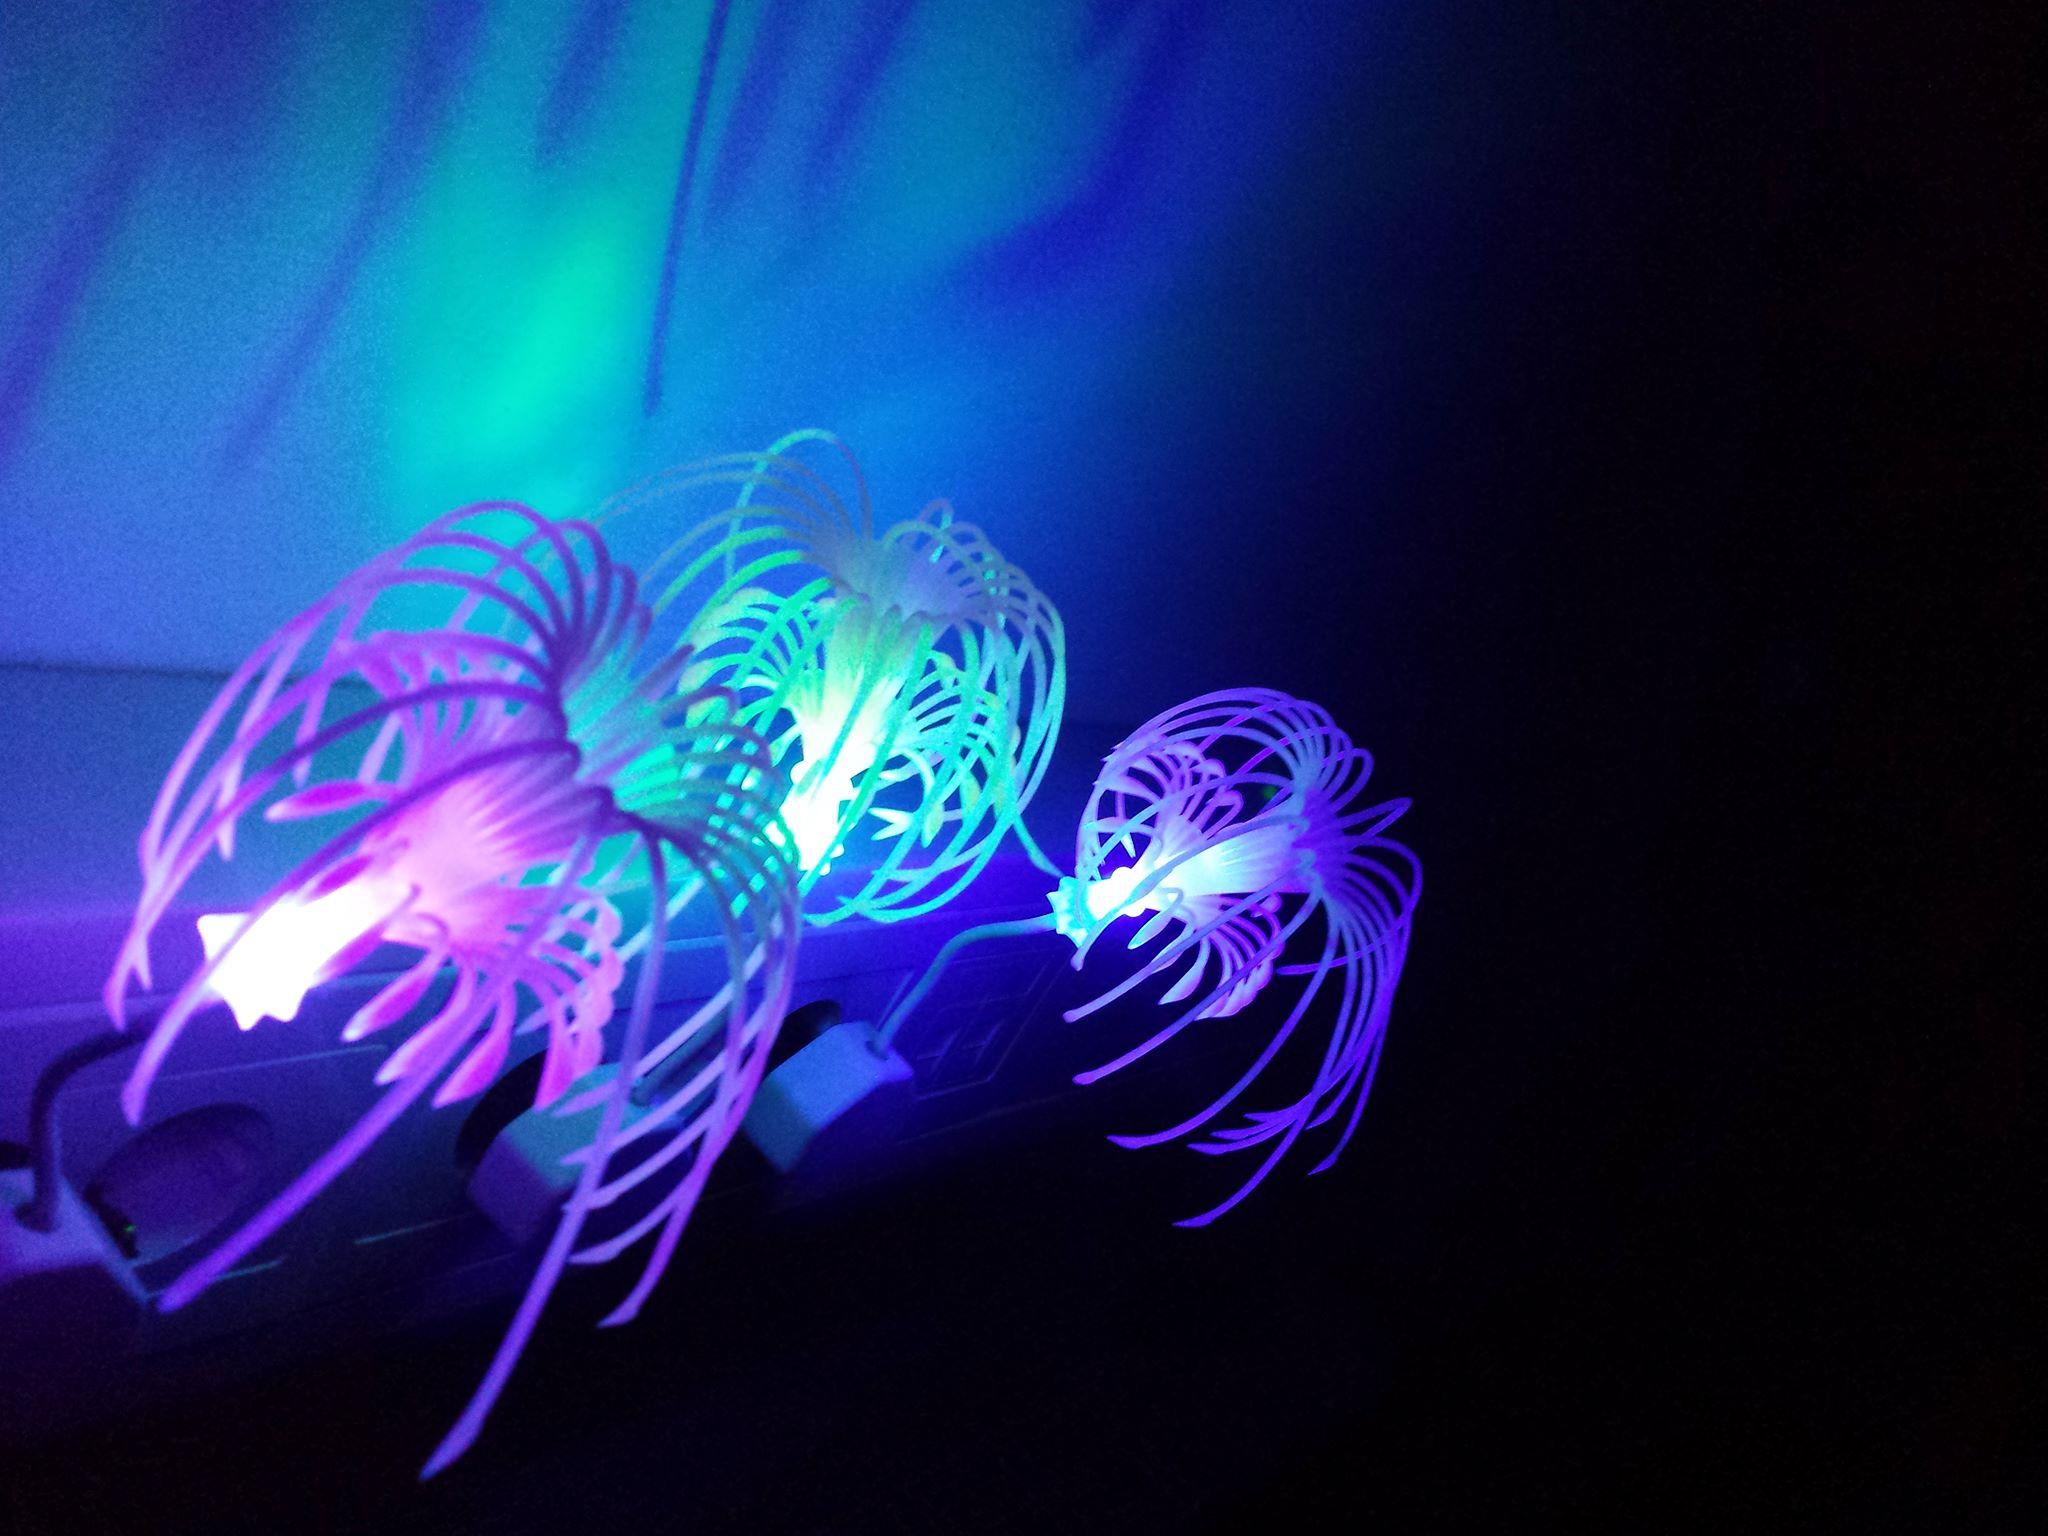 Magične lučke v Utrinku sanj